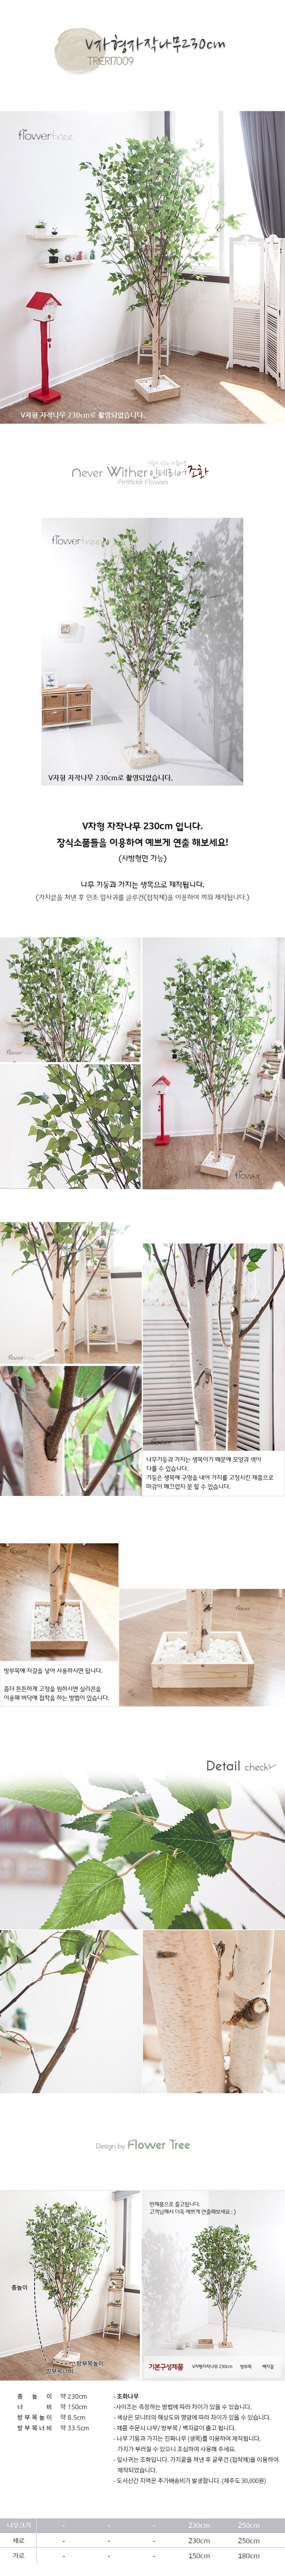 V자형자작나무 230cm FREOFT - 플라워트리, 286,000원, 조화, 카네이션(조화)